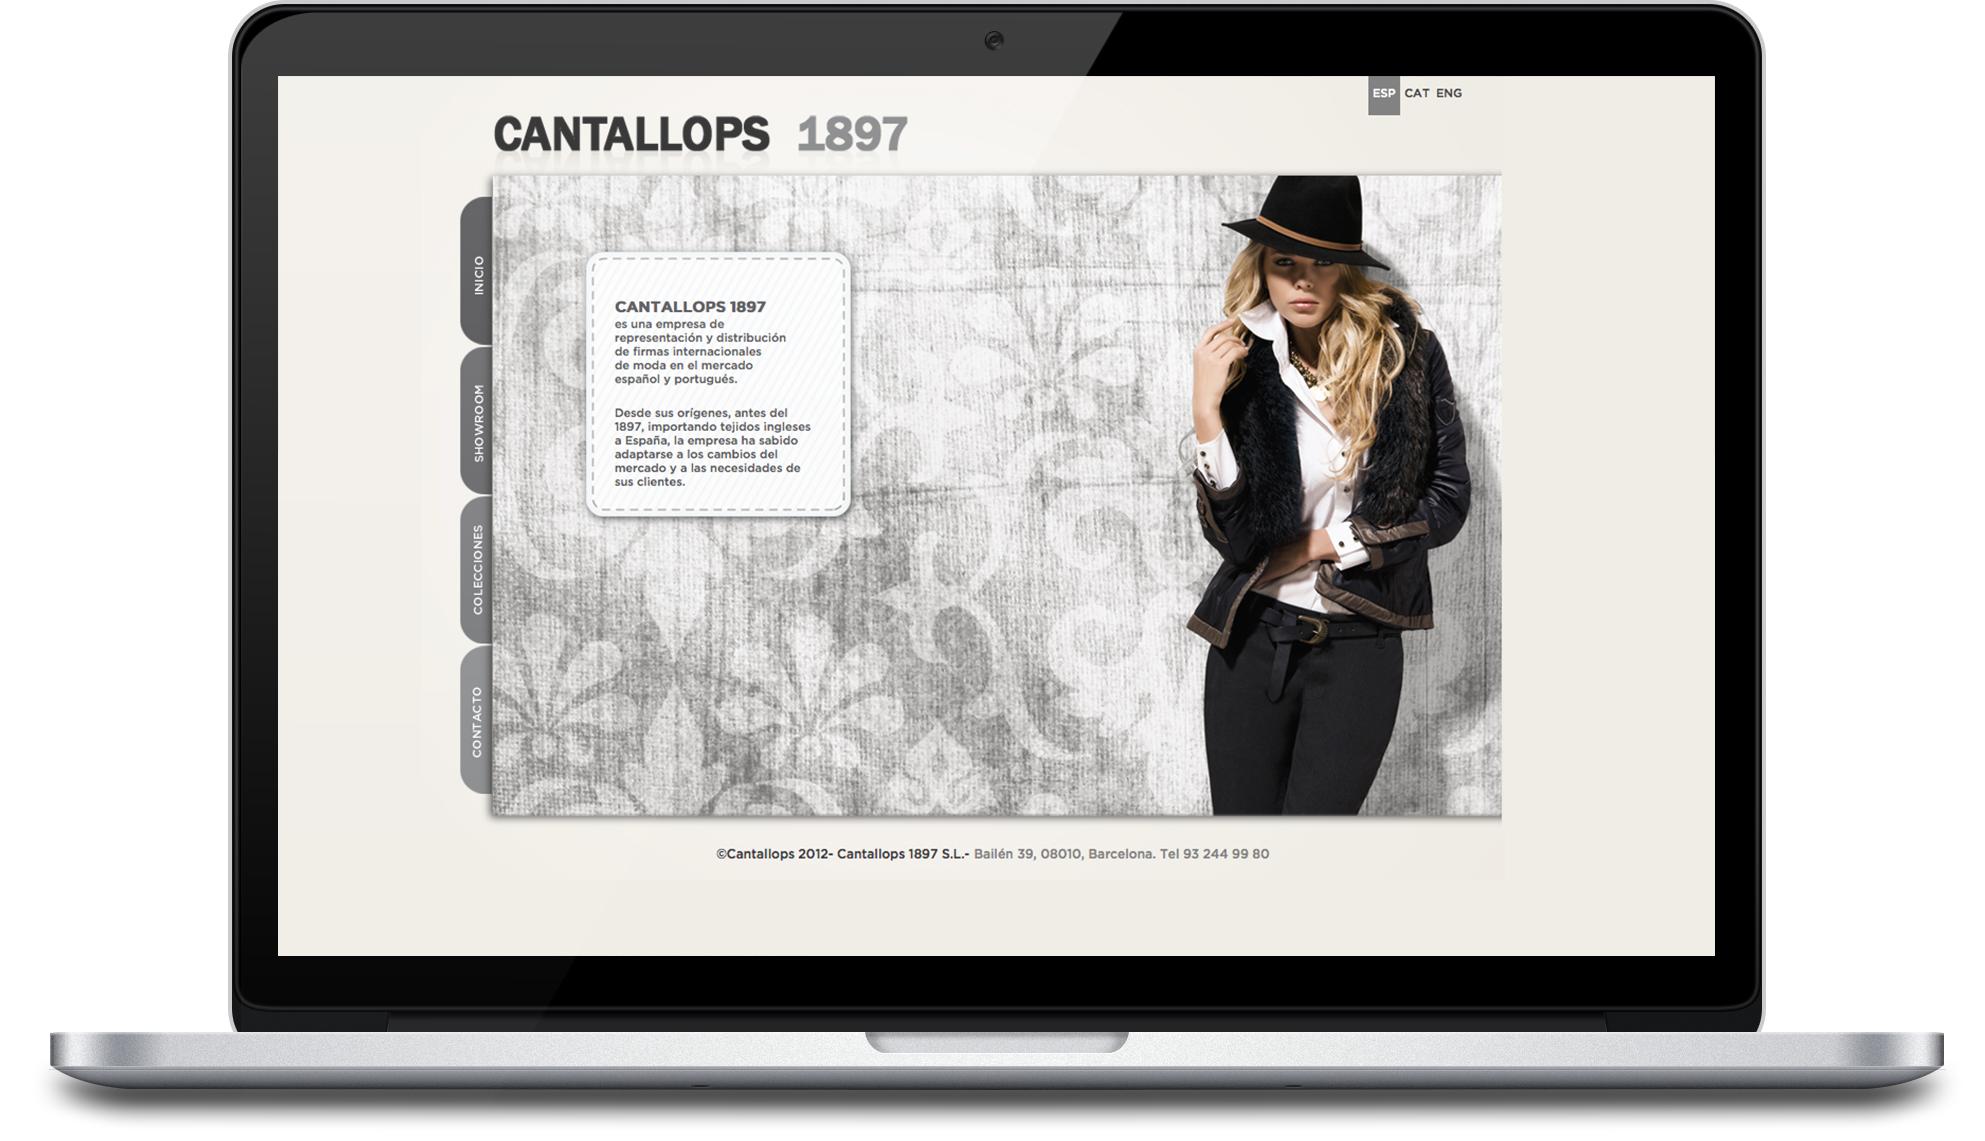 Cantallops